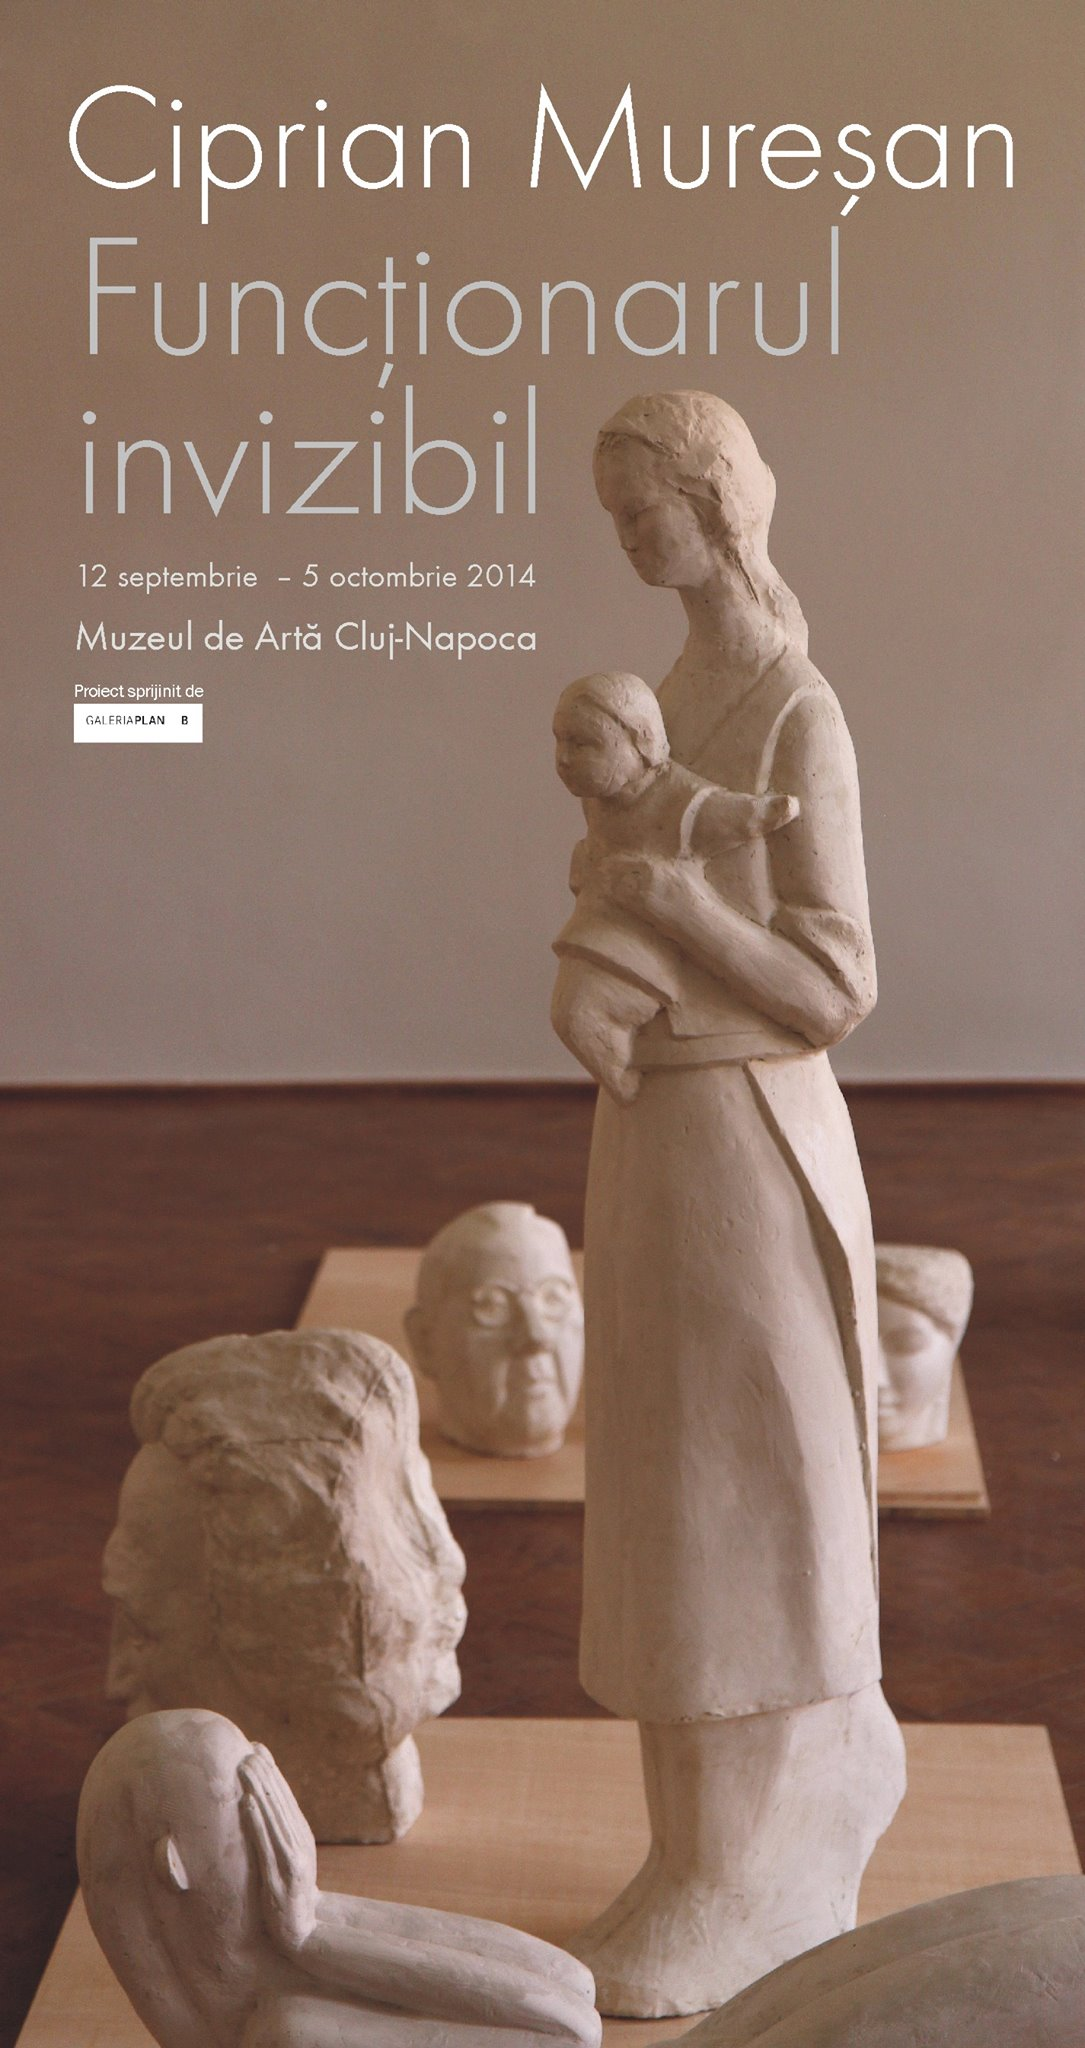 Ciprian Mureșan Functionarul invizibil @ Muzeul de Arta Cluj-Napoca (9)